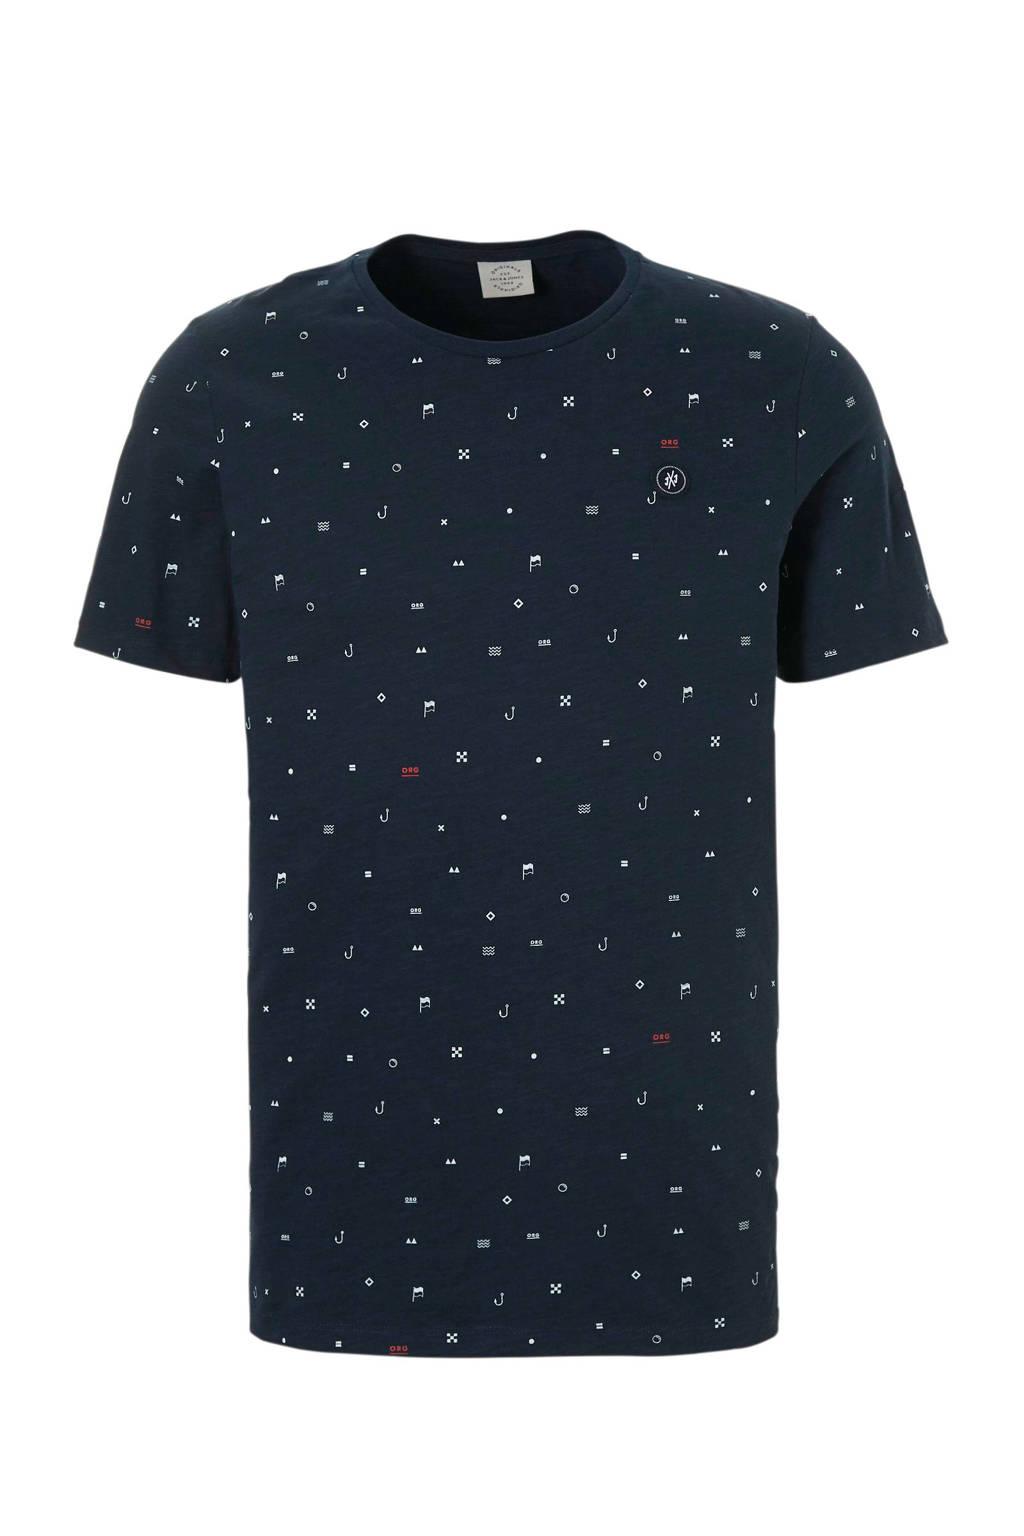 Jack & Jones Originals T-shirt Crusoe met print marine, Marine/wit